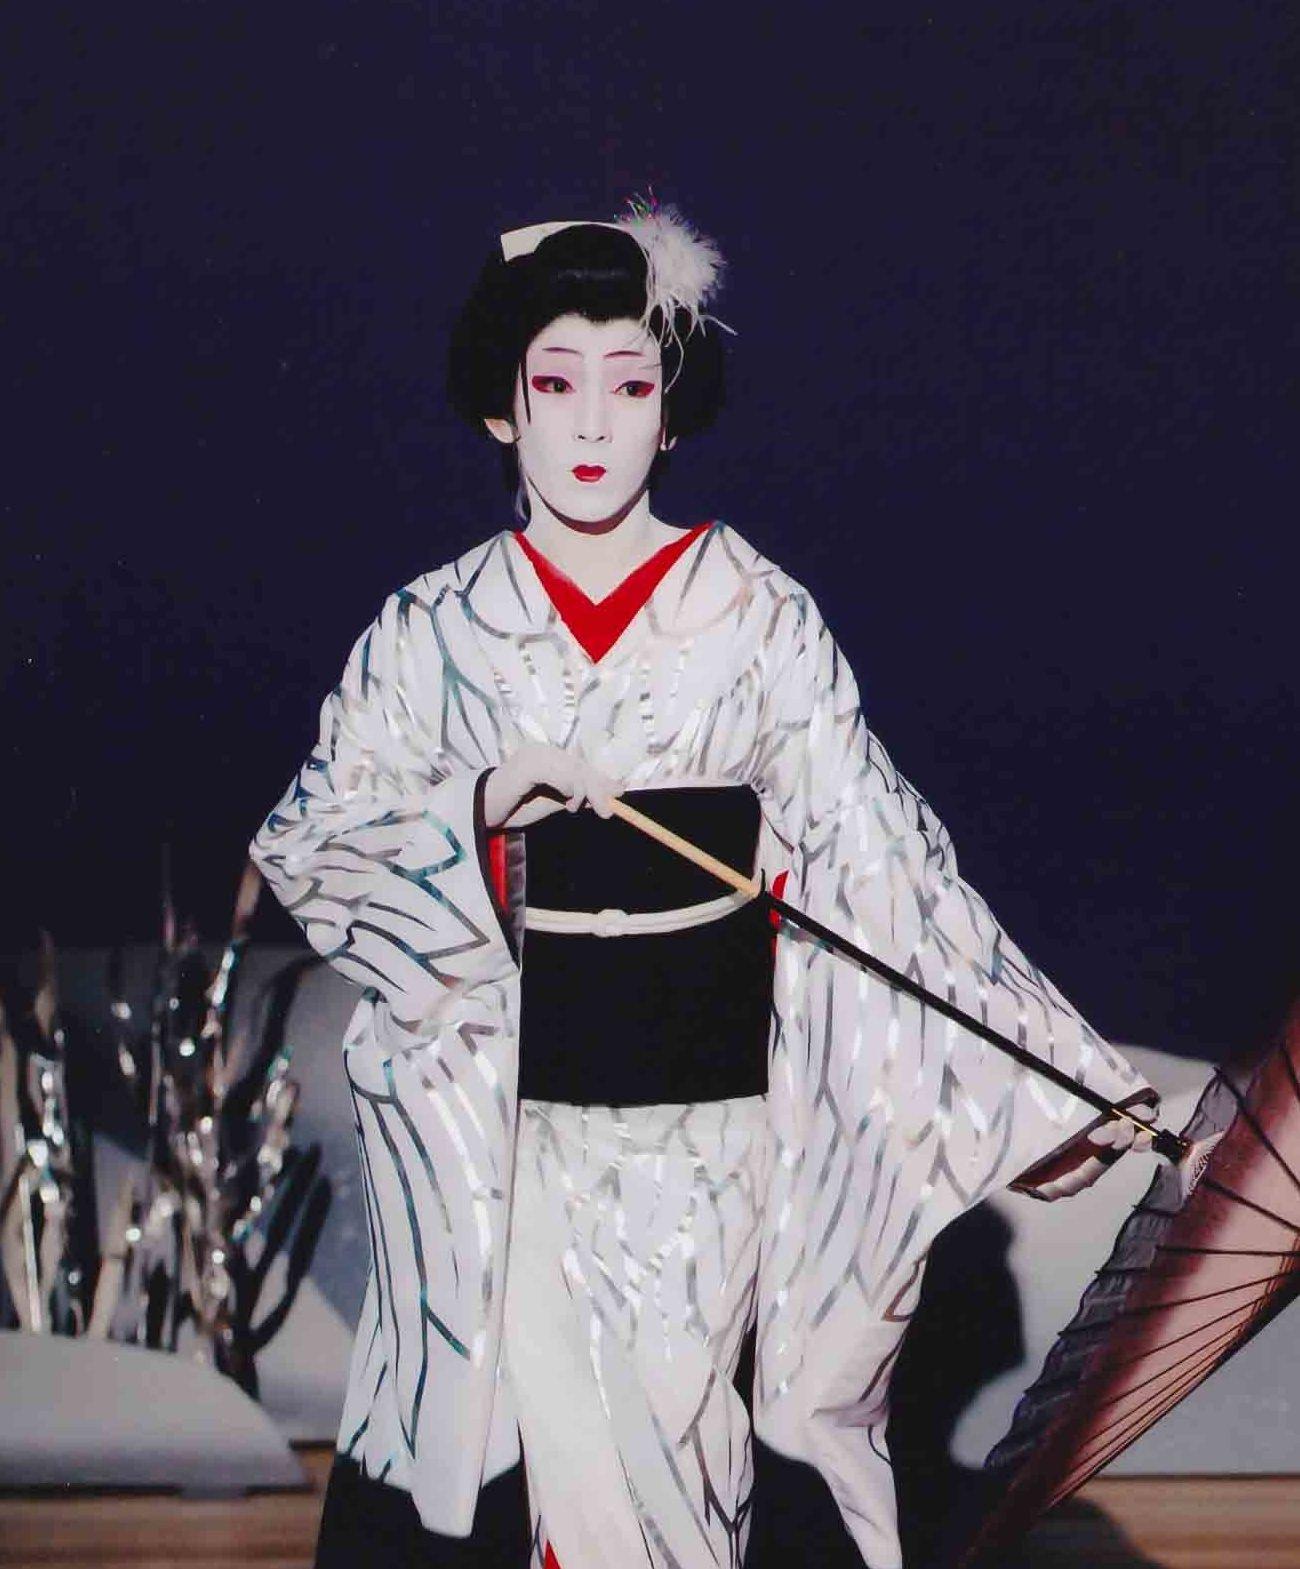 Wakashu kabuki